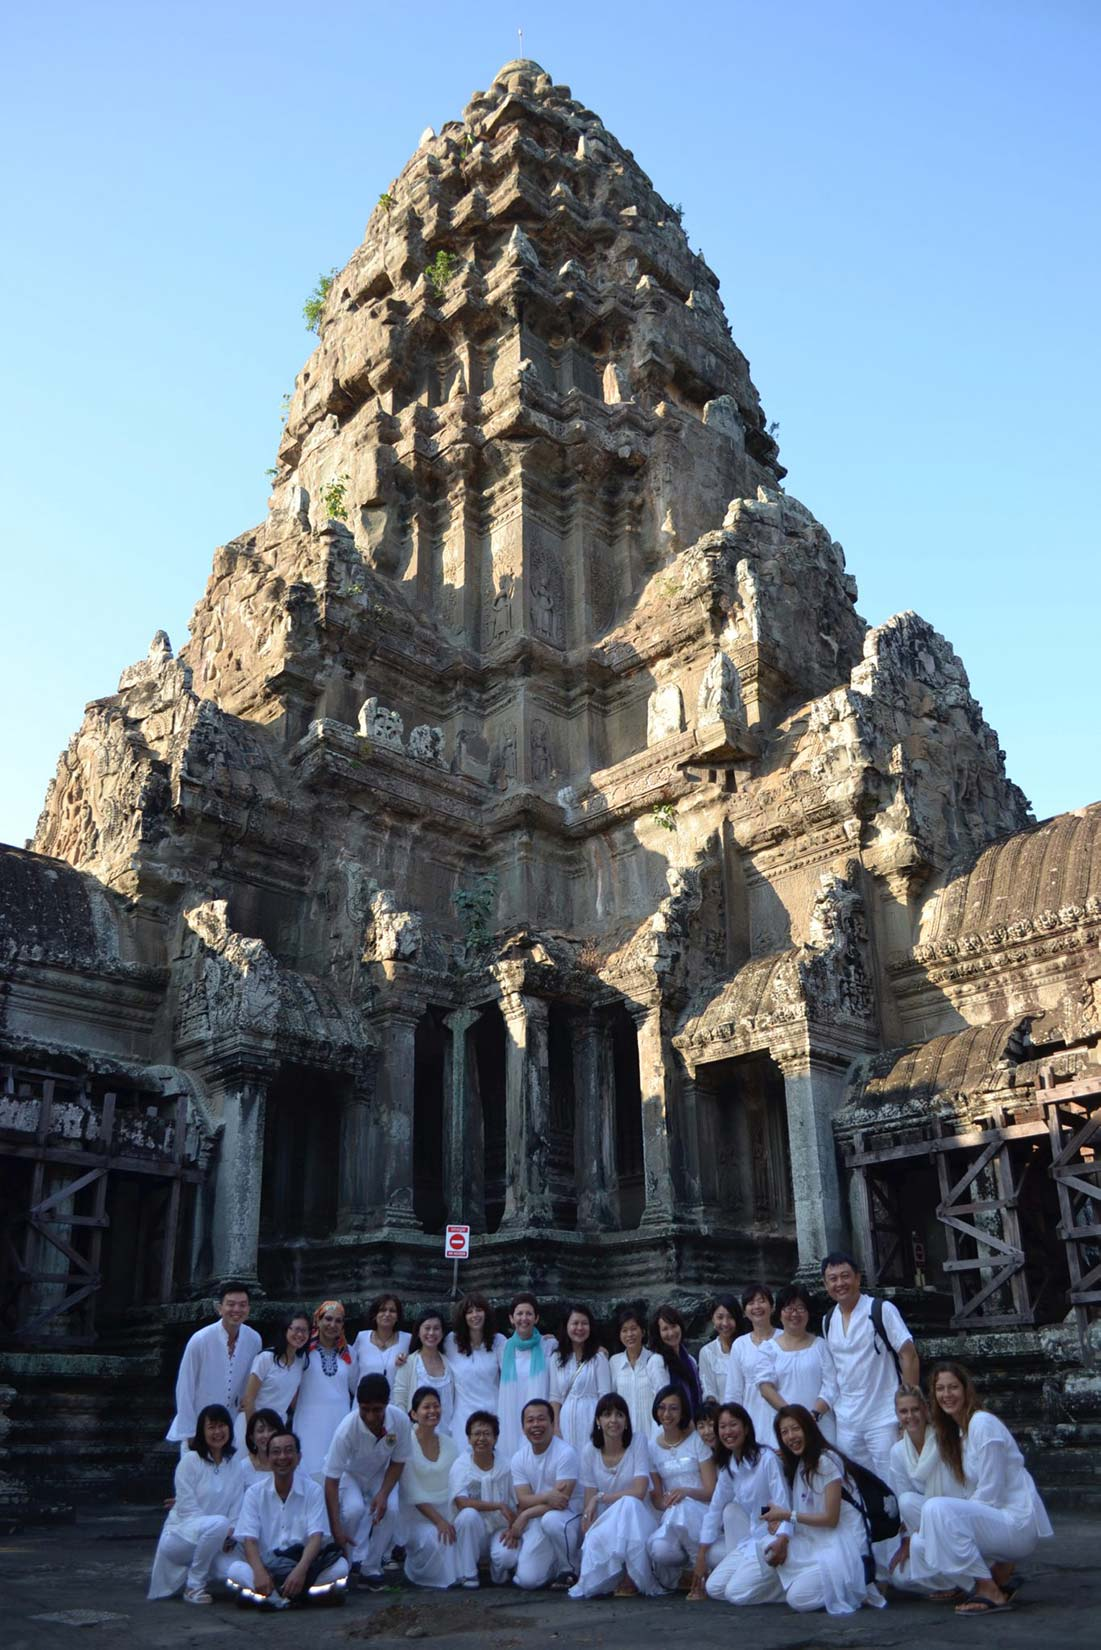 Angkor Wat Private Entry, Cambodia